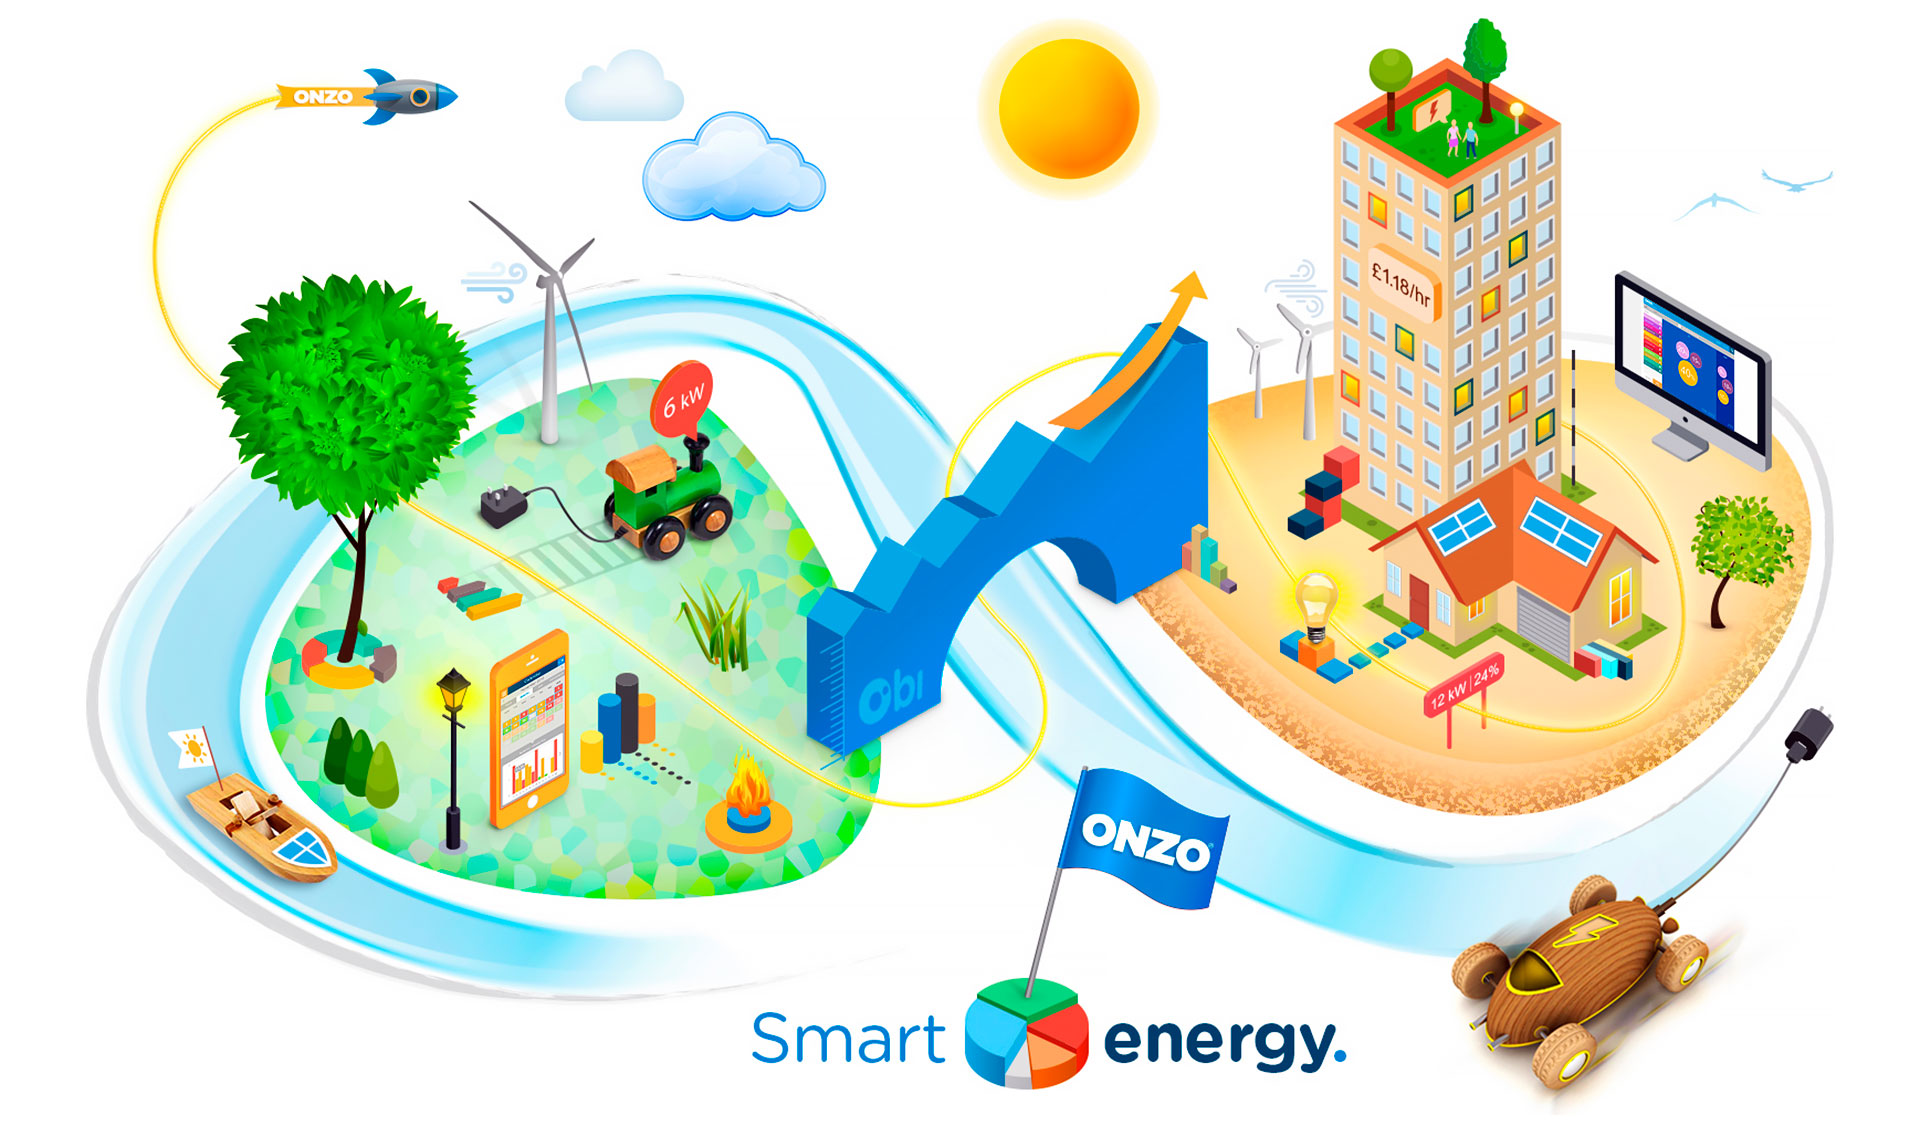 obi - smart energy